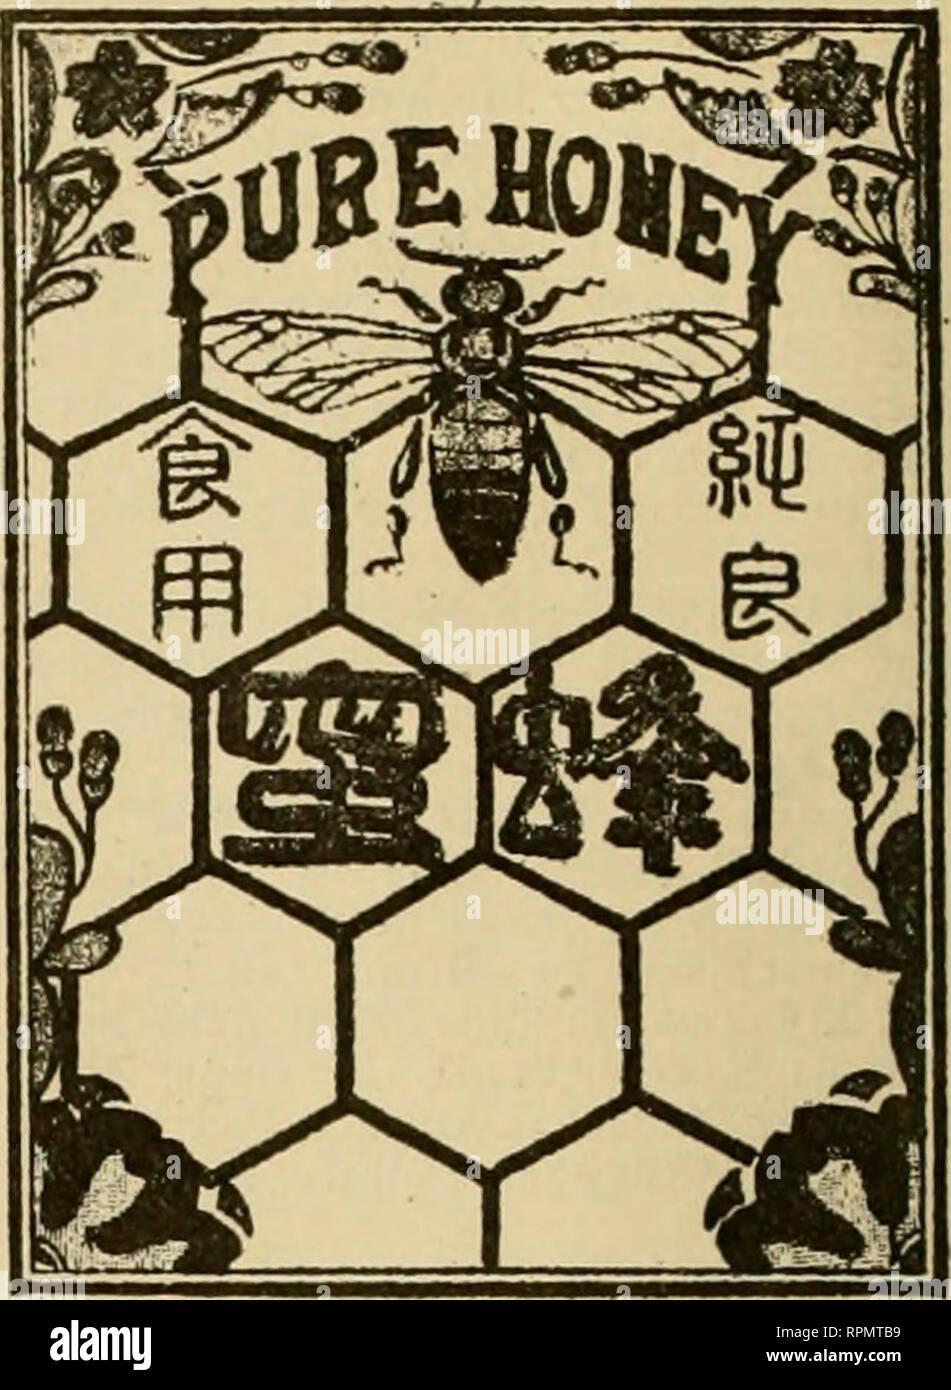 American bee journal  Bee culture